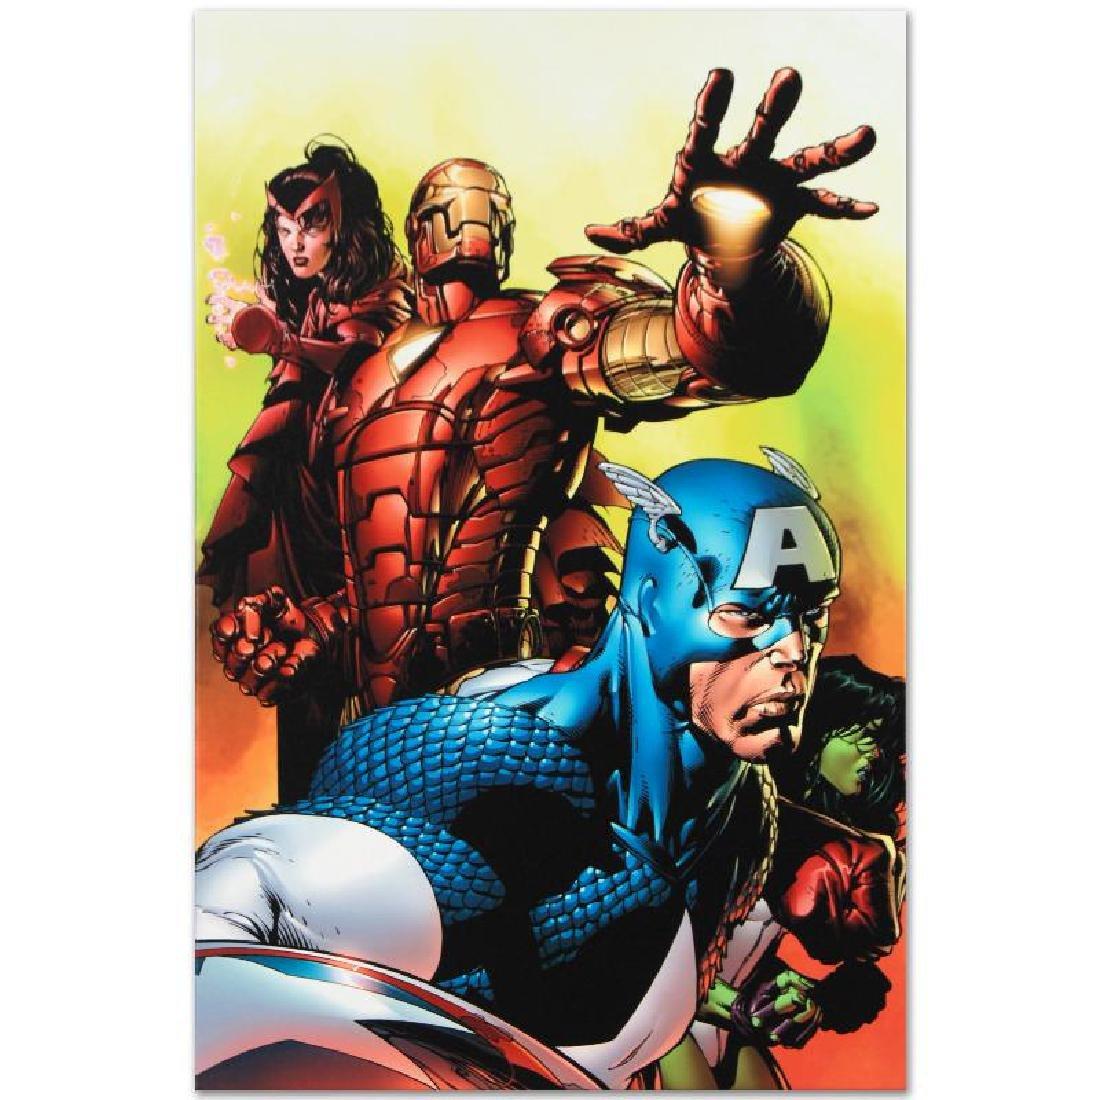 Avengers #501 by Marvel Comics - 3